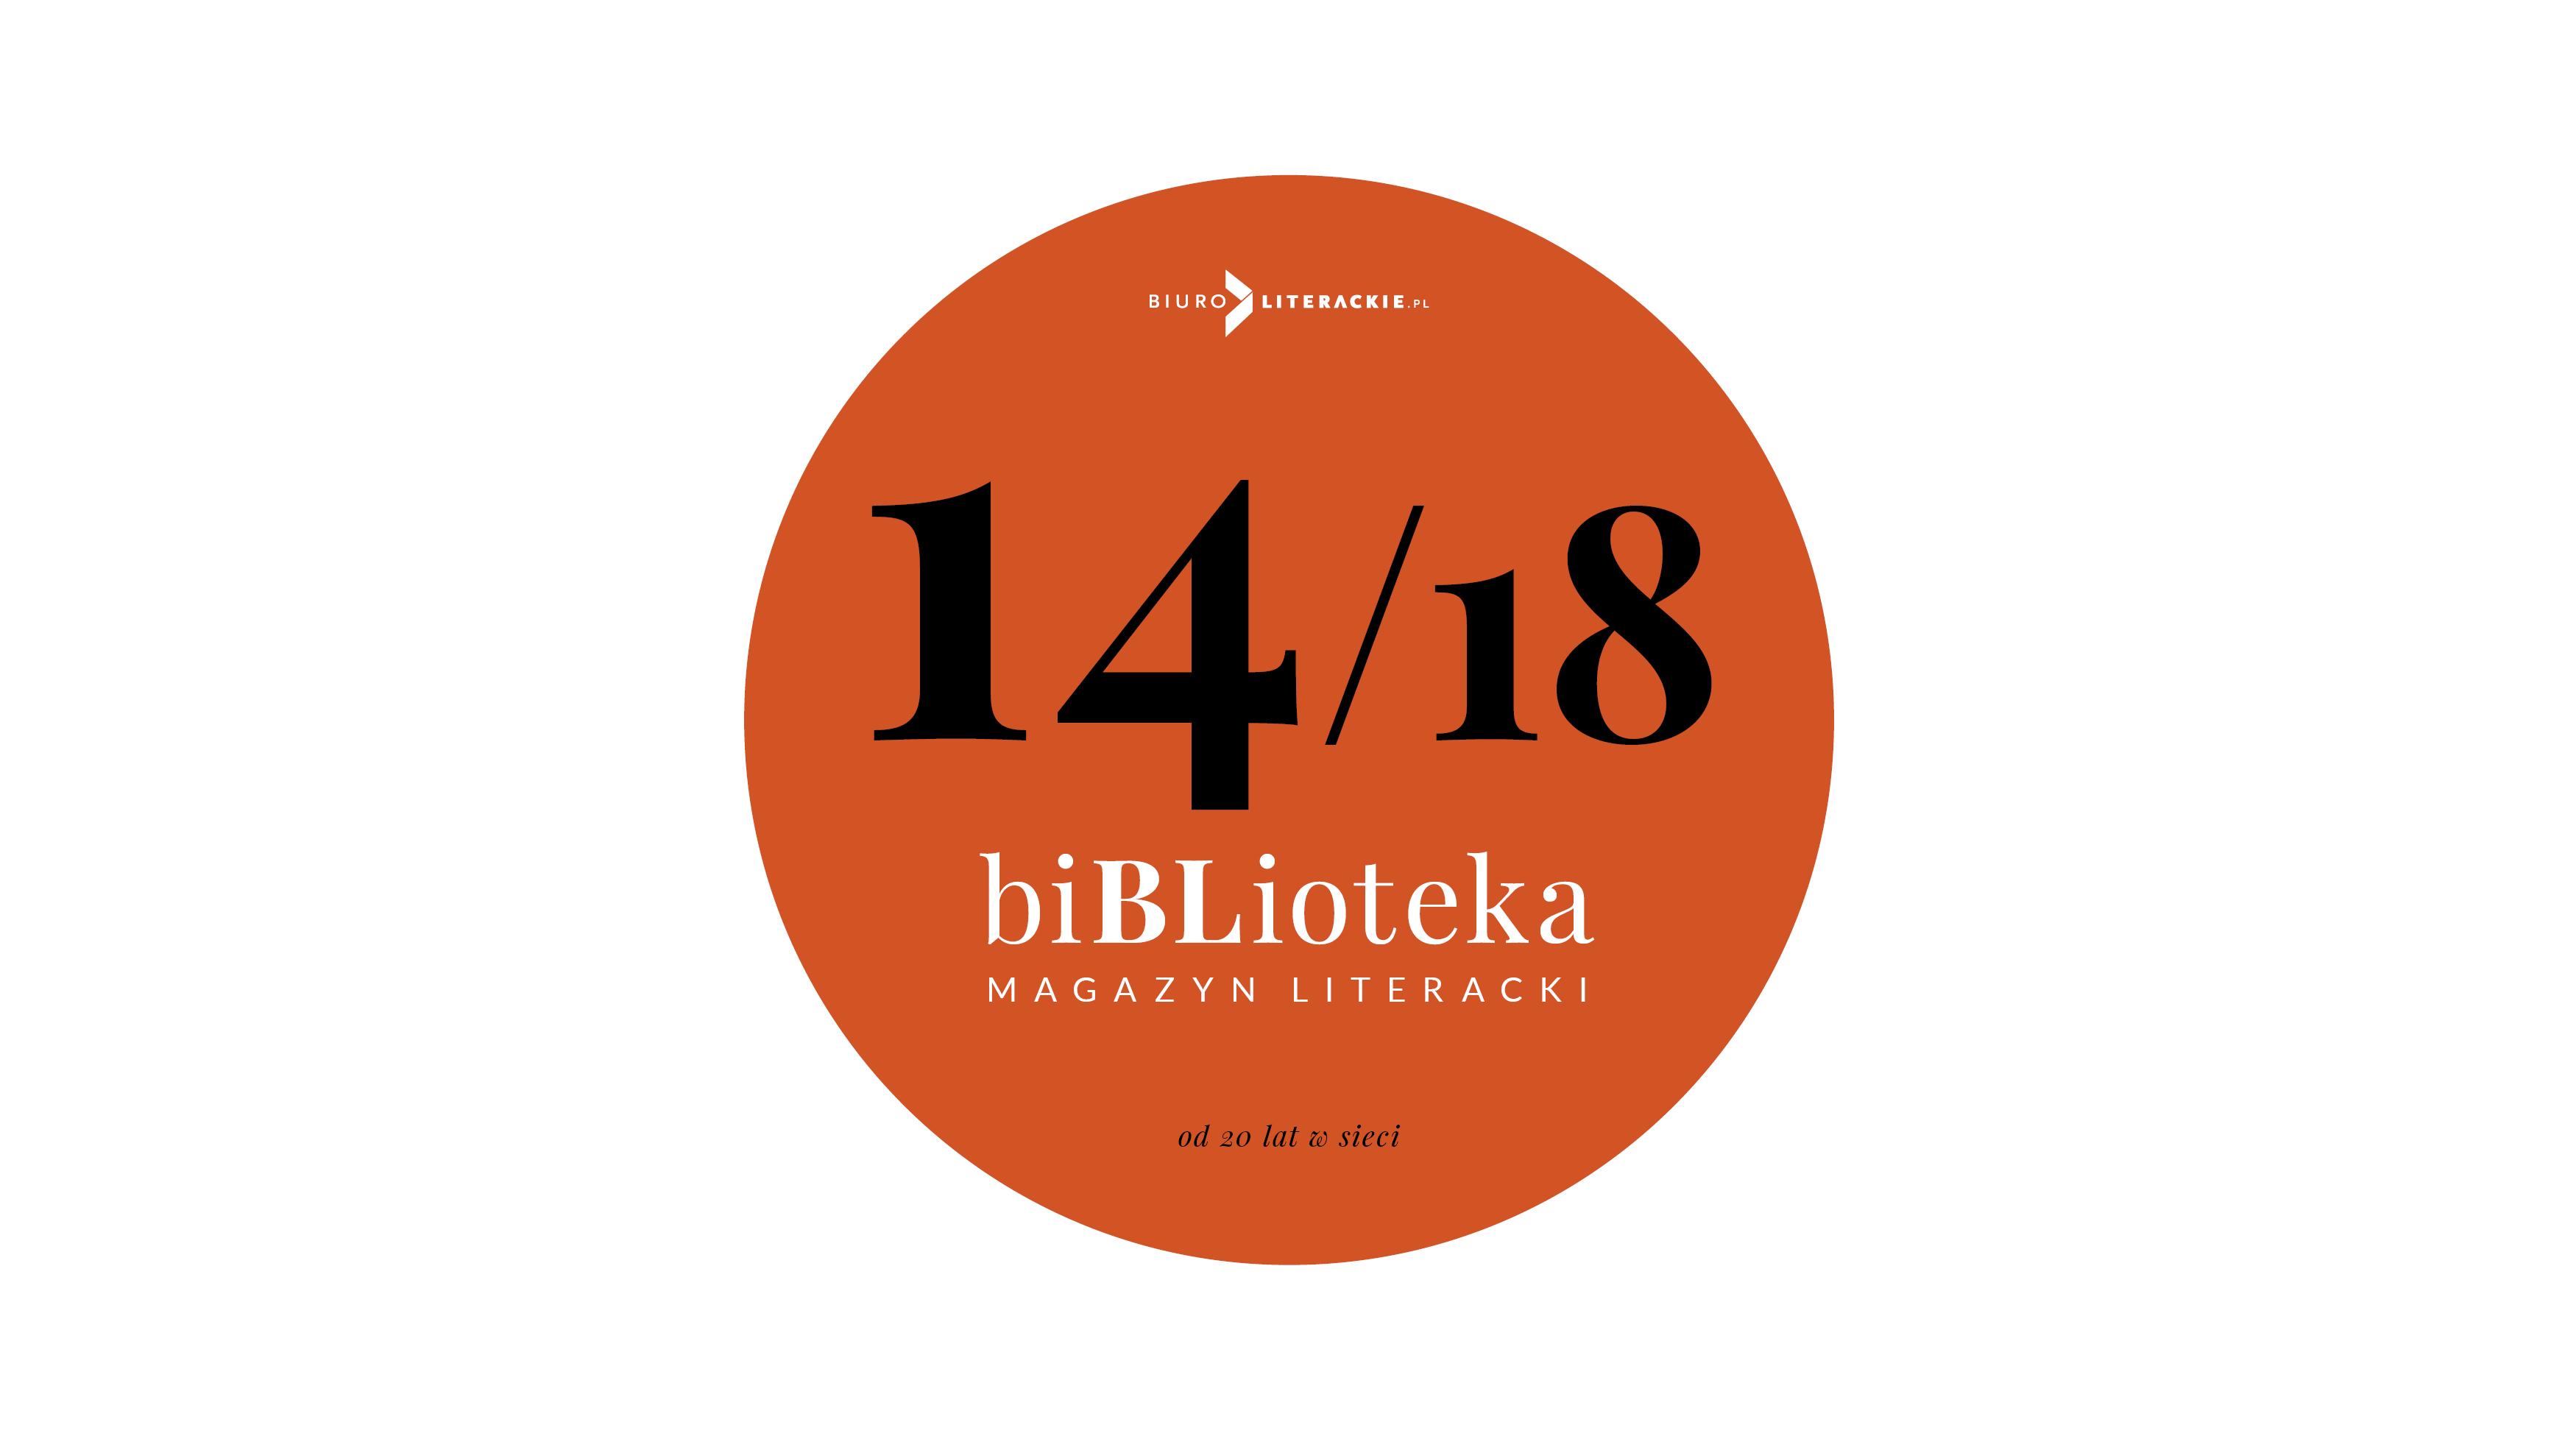 BL Info 2018.10.16 biBLioteka nr 14__top_www